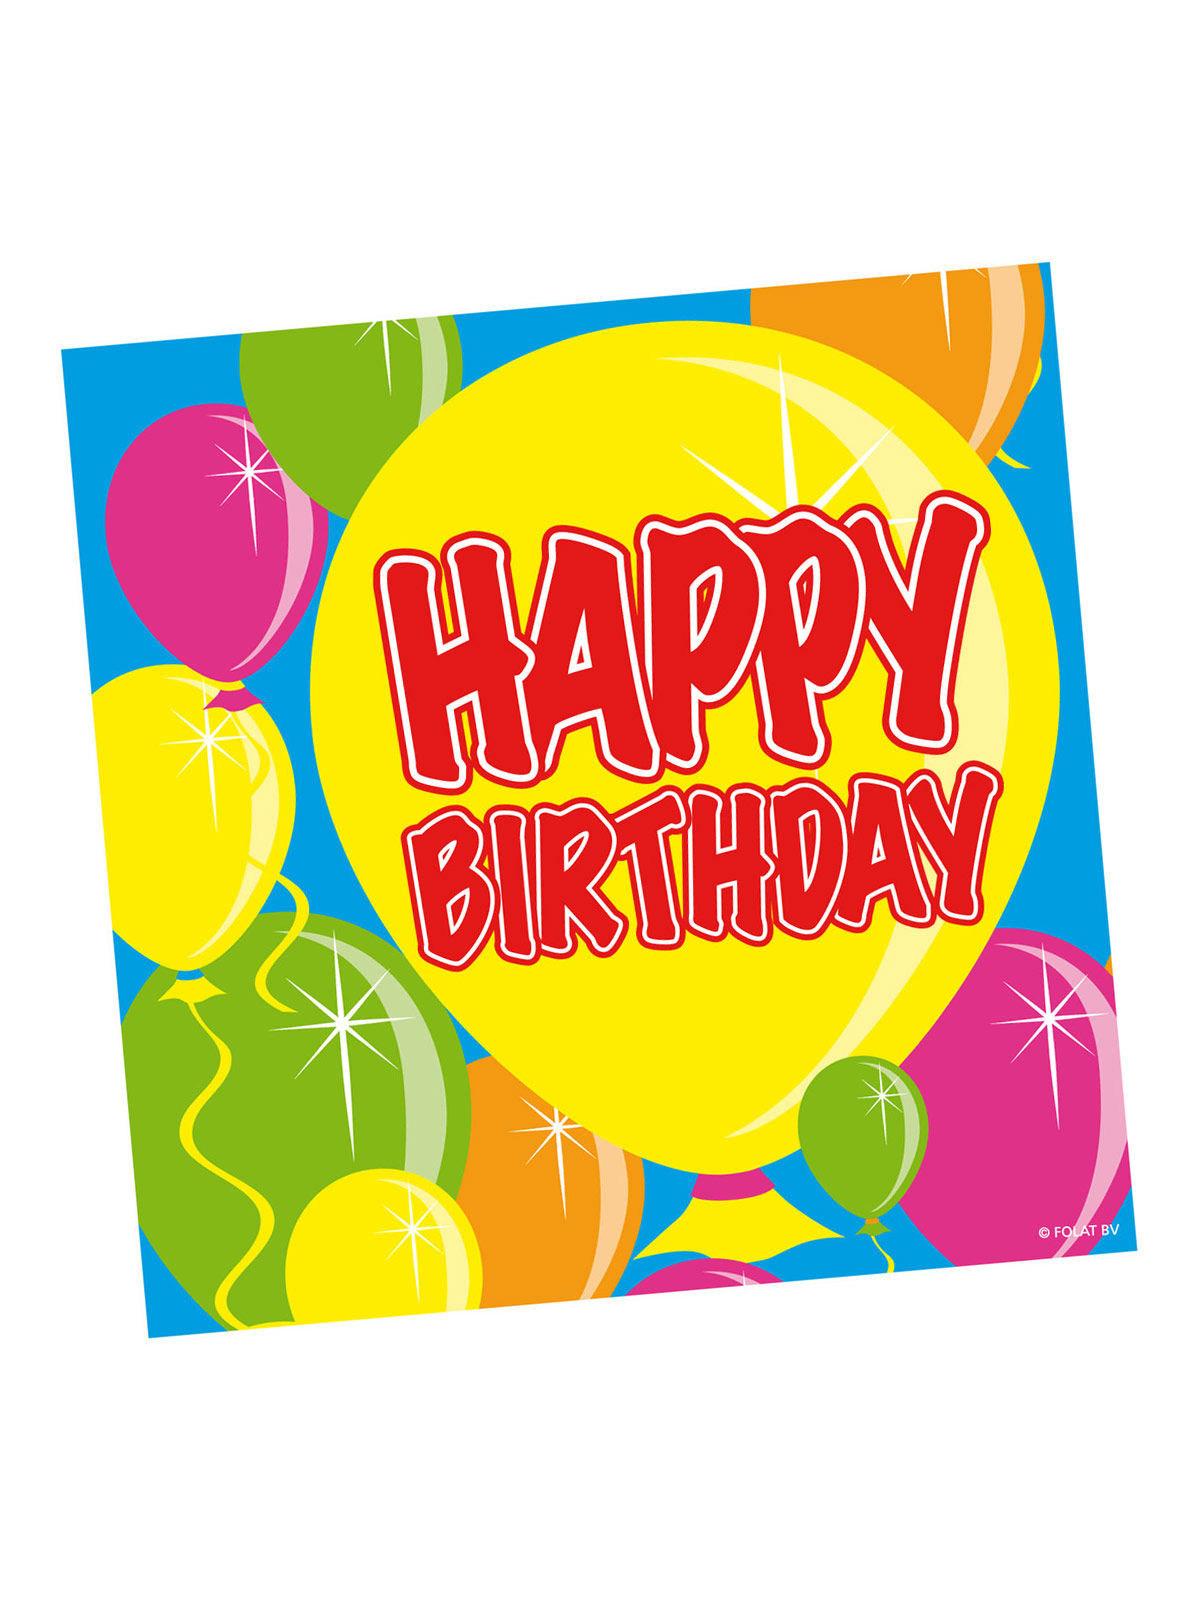 Happy birthday servietten geburtstag party deko 20 st ck - Deko 25 geburtstag ...